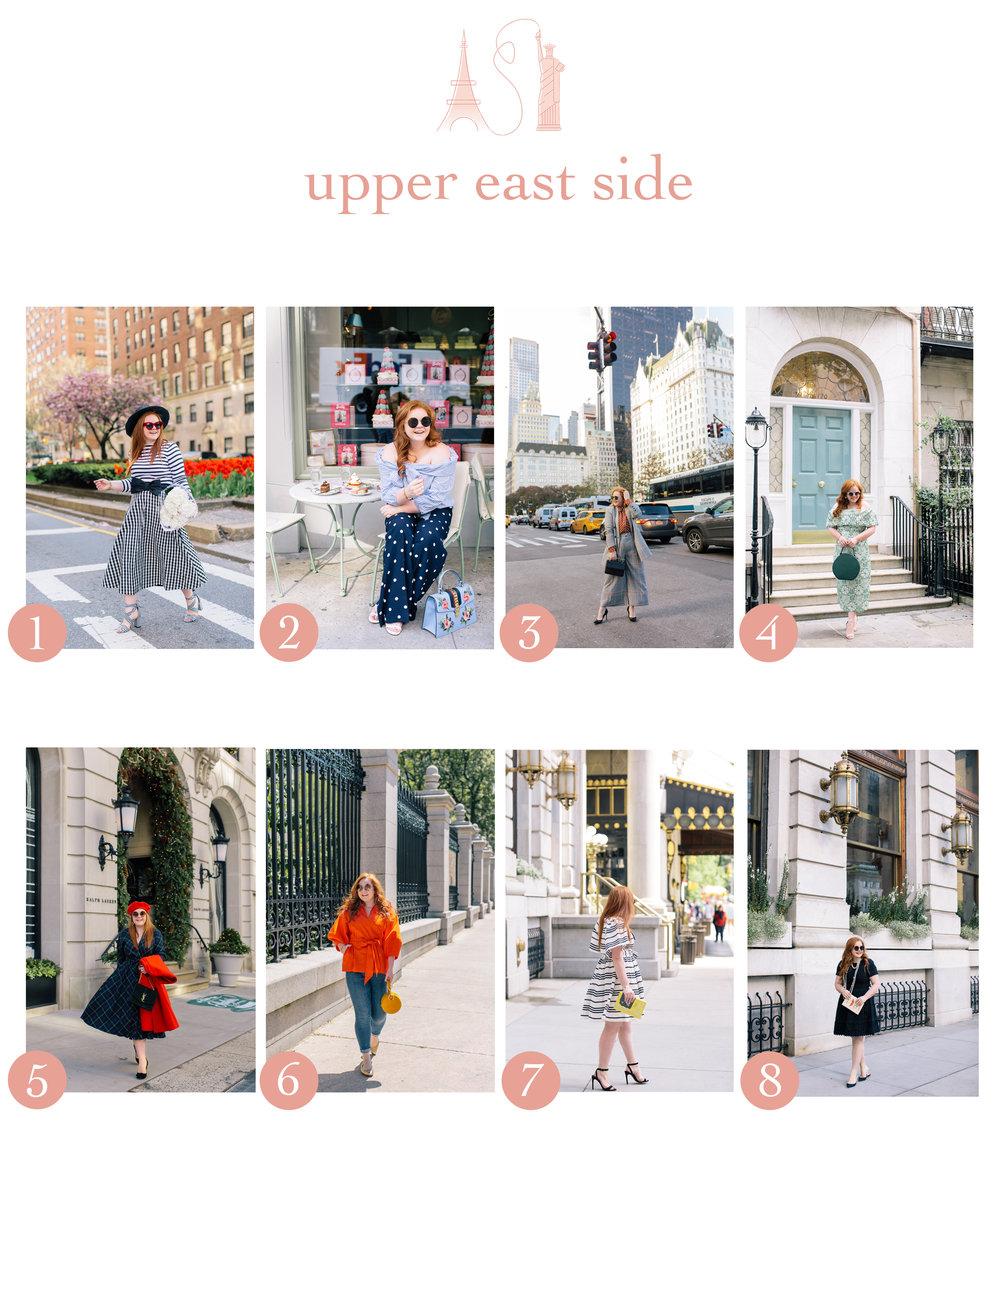 upper_east_side_photo_locations.jpg